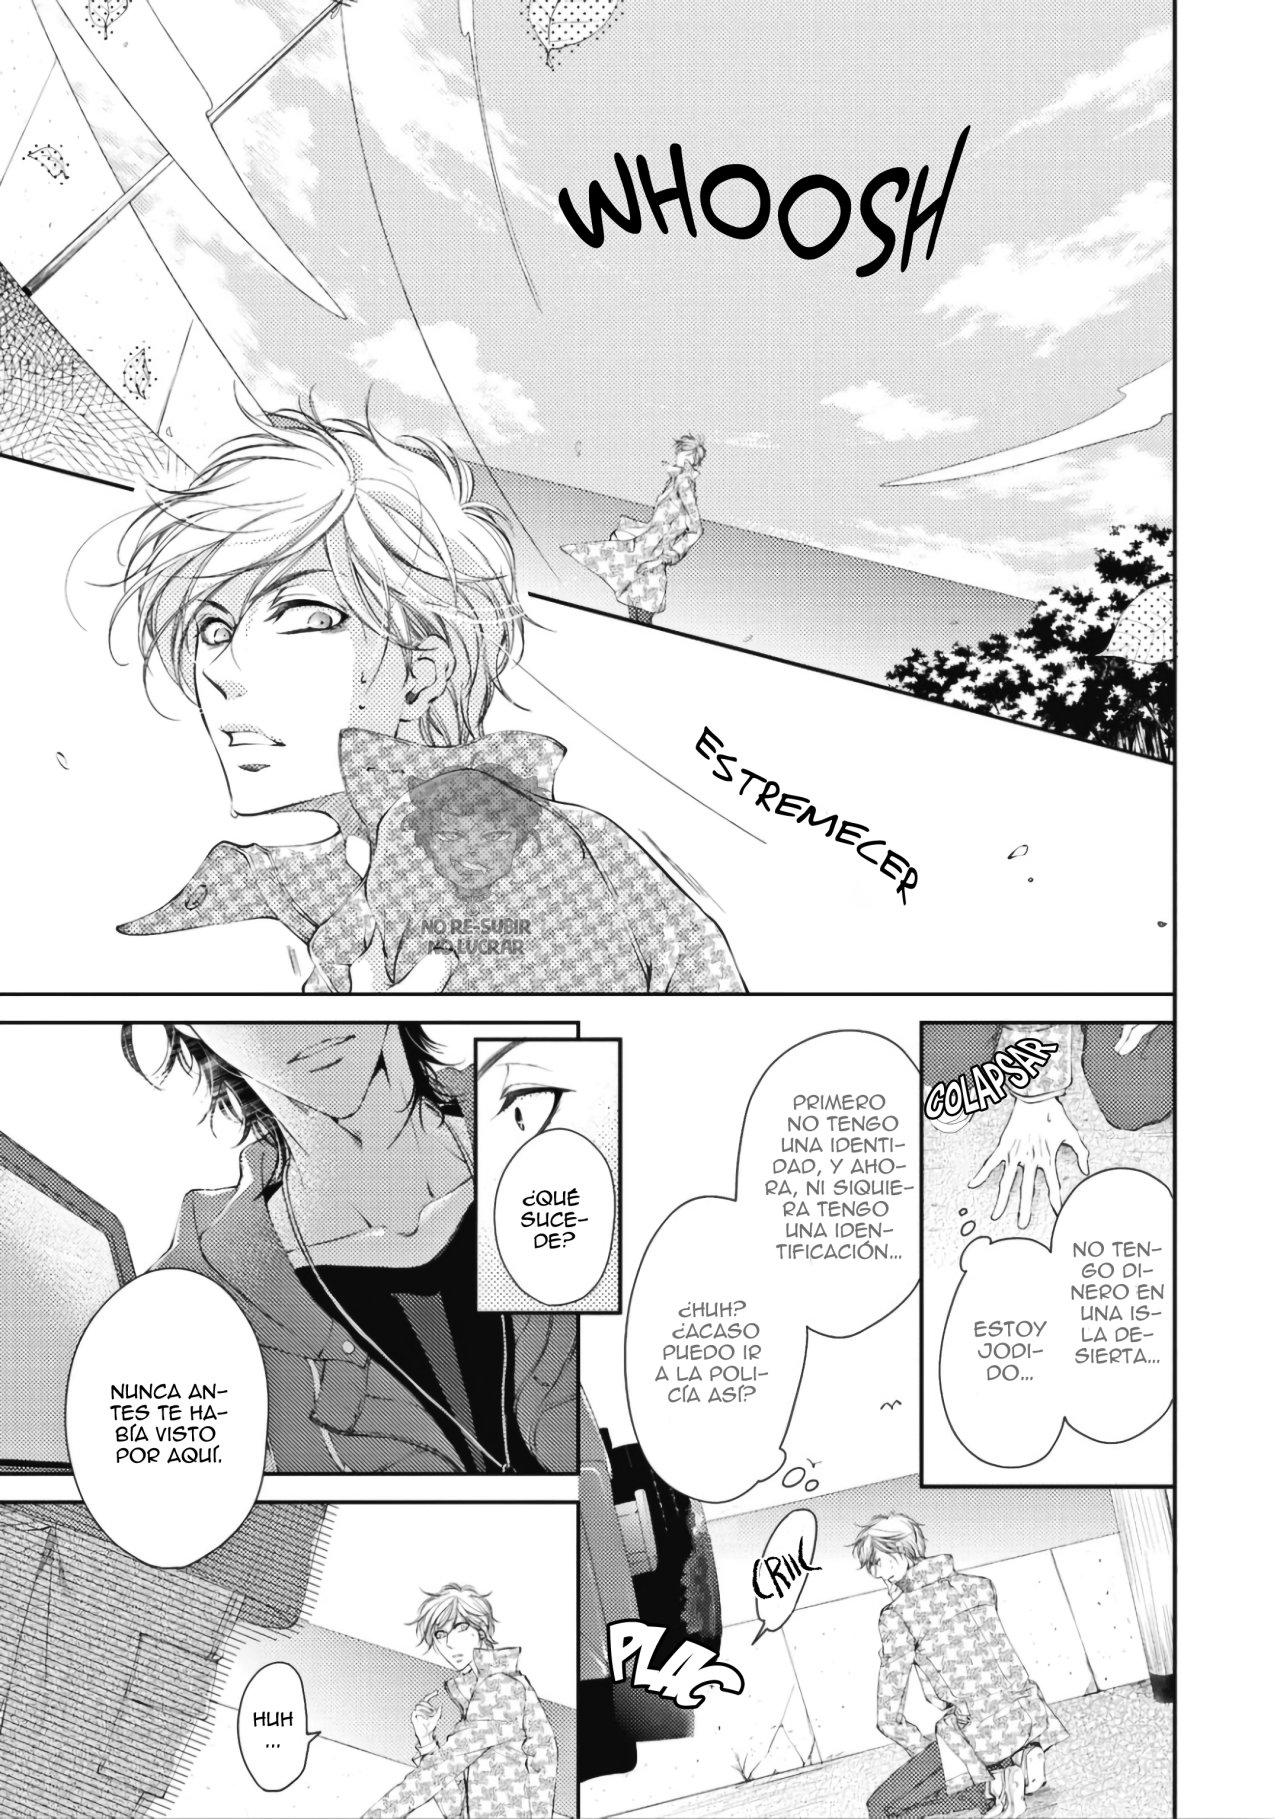 https://nine.mangadogs.com/es_manga/pic8/51/36659/946321/29de29f2593b65f060a8bcc3b06f9b64.jpg Page 11